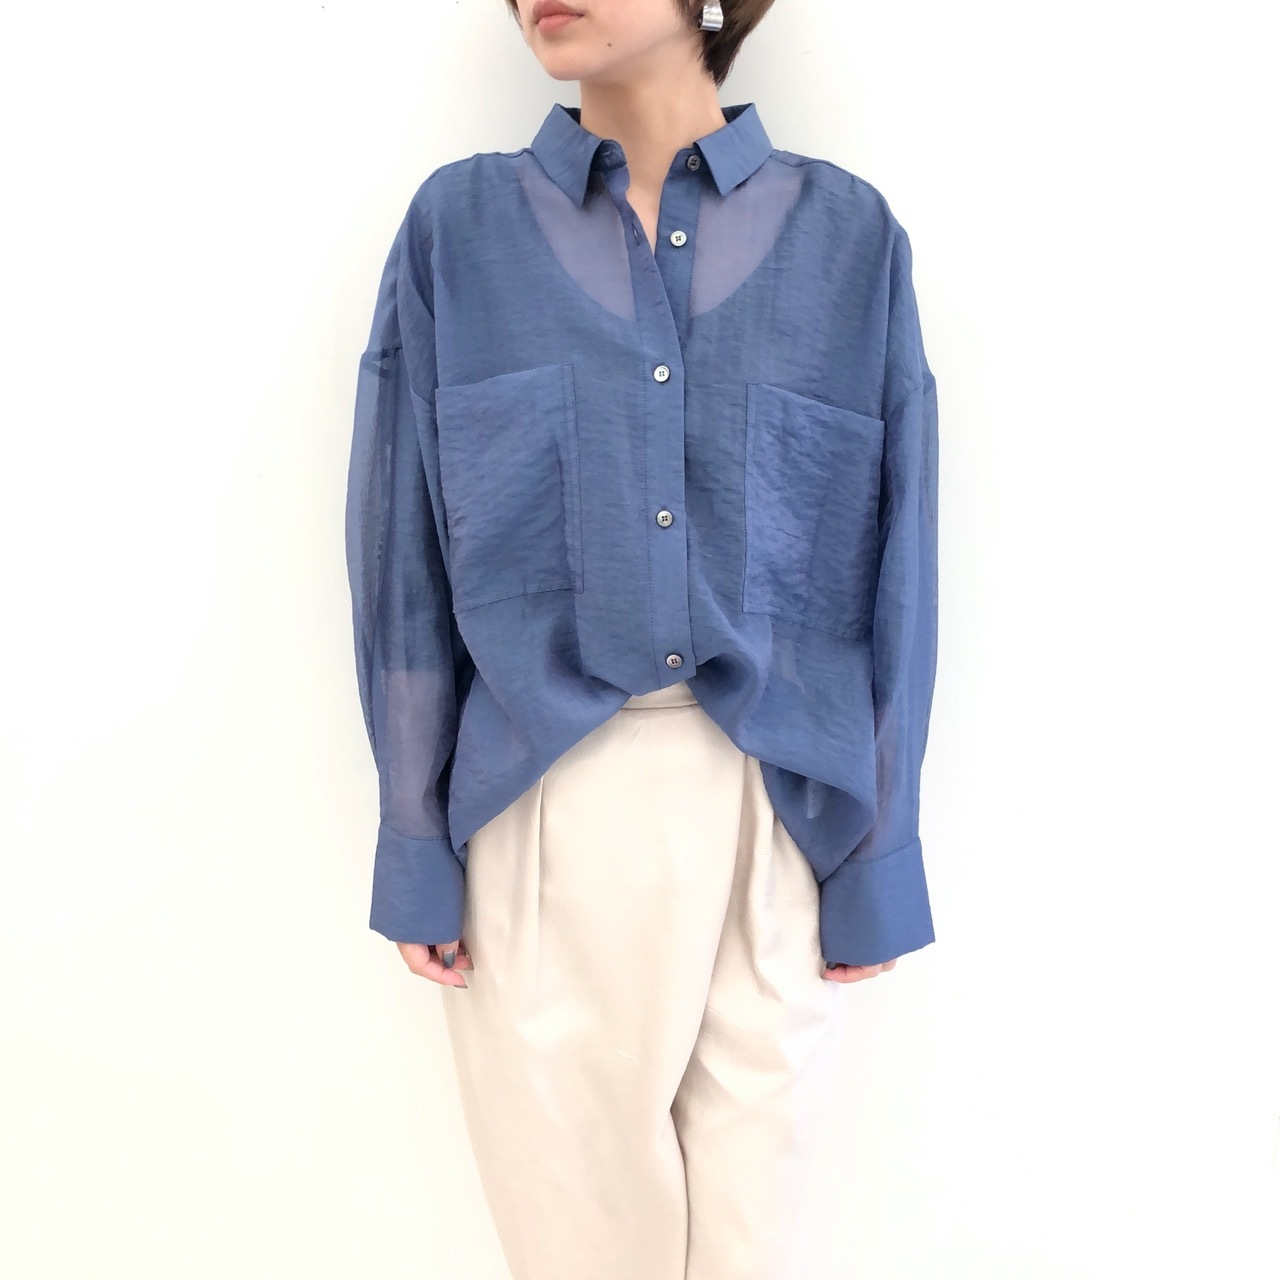 【 CHIGNONSTAR 】- 1692-437 - シアーシャツ